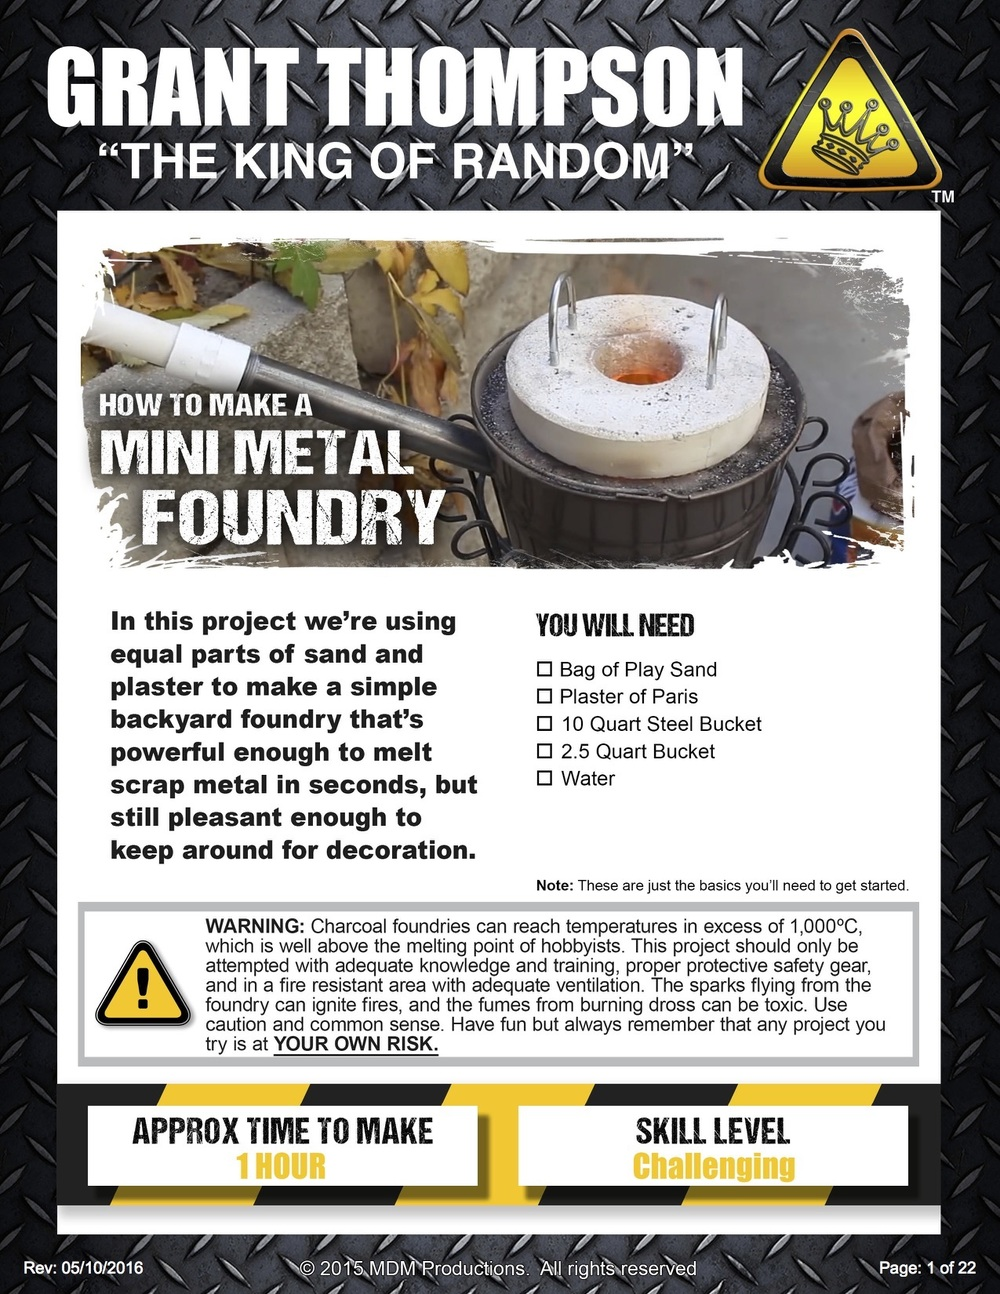 how to make a mini metal foundry u2014 the king of random